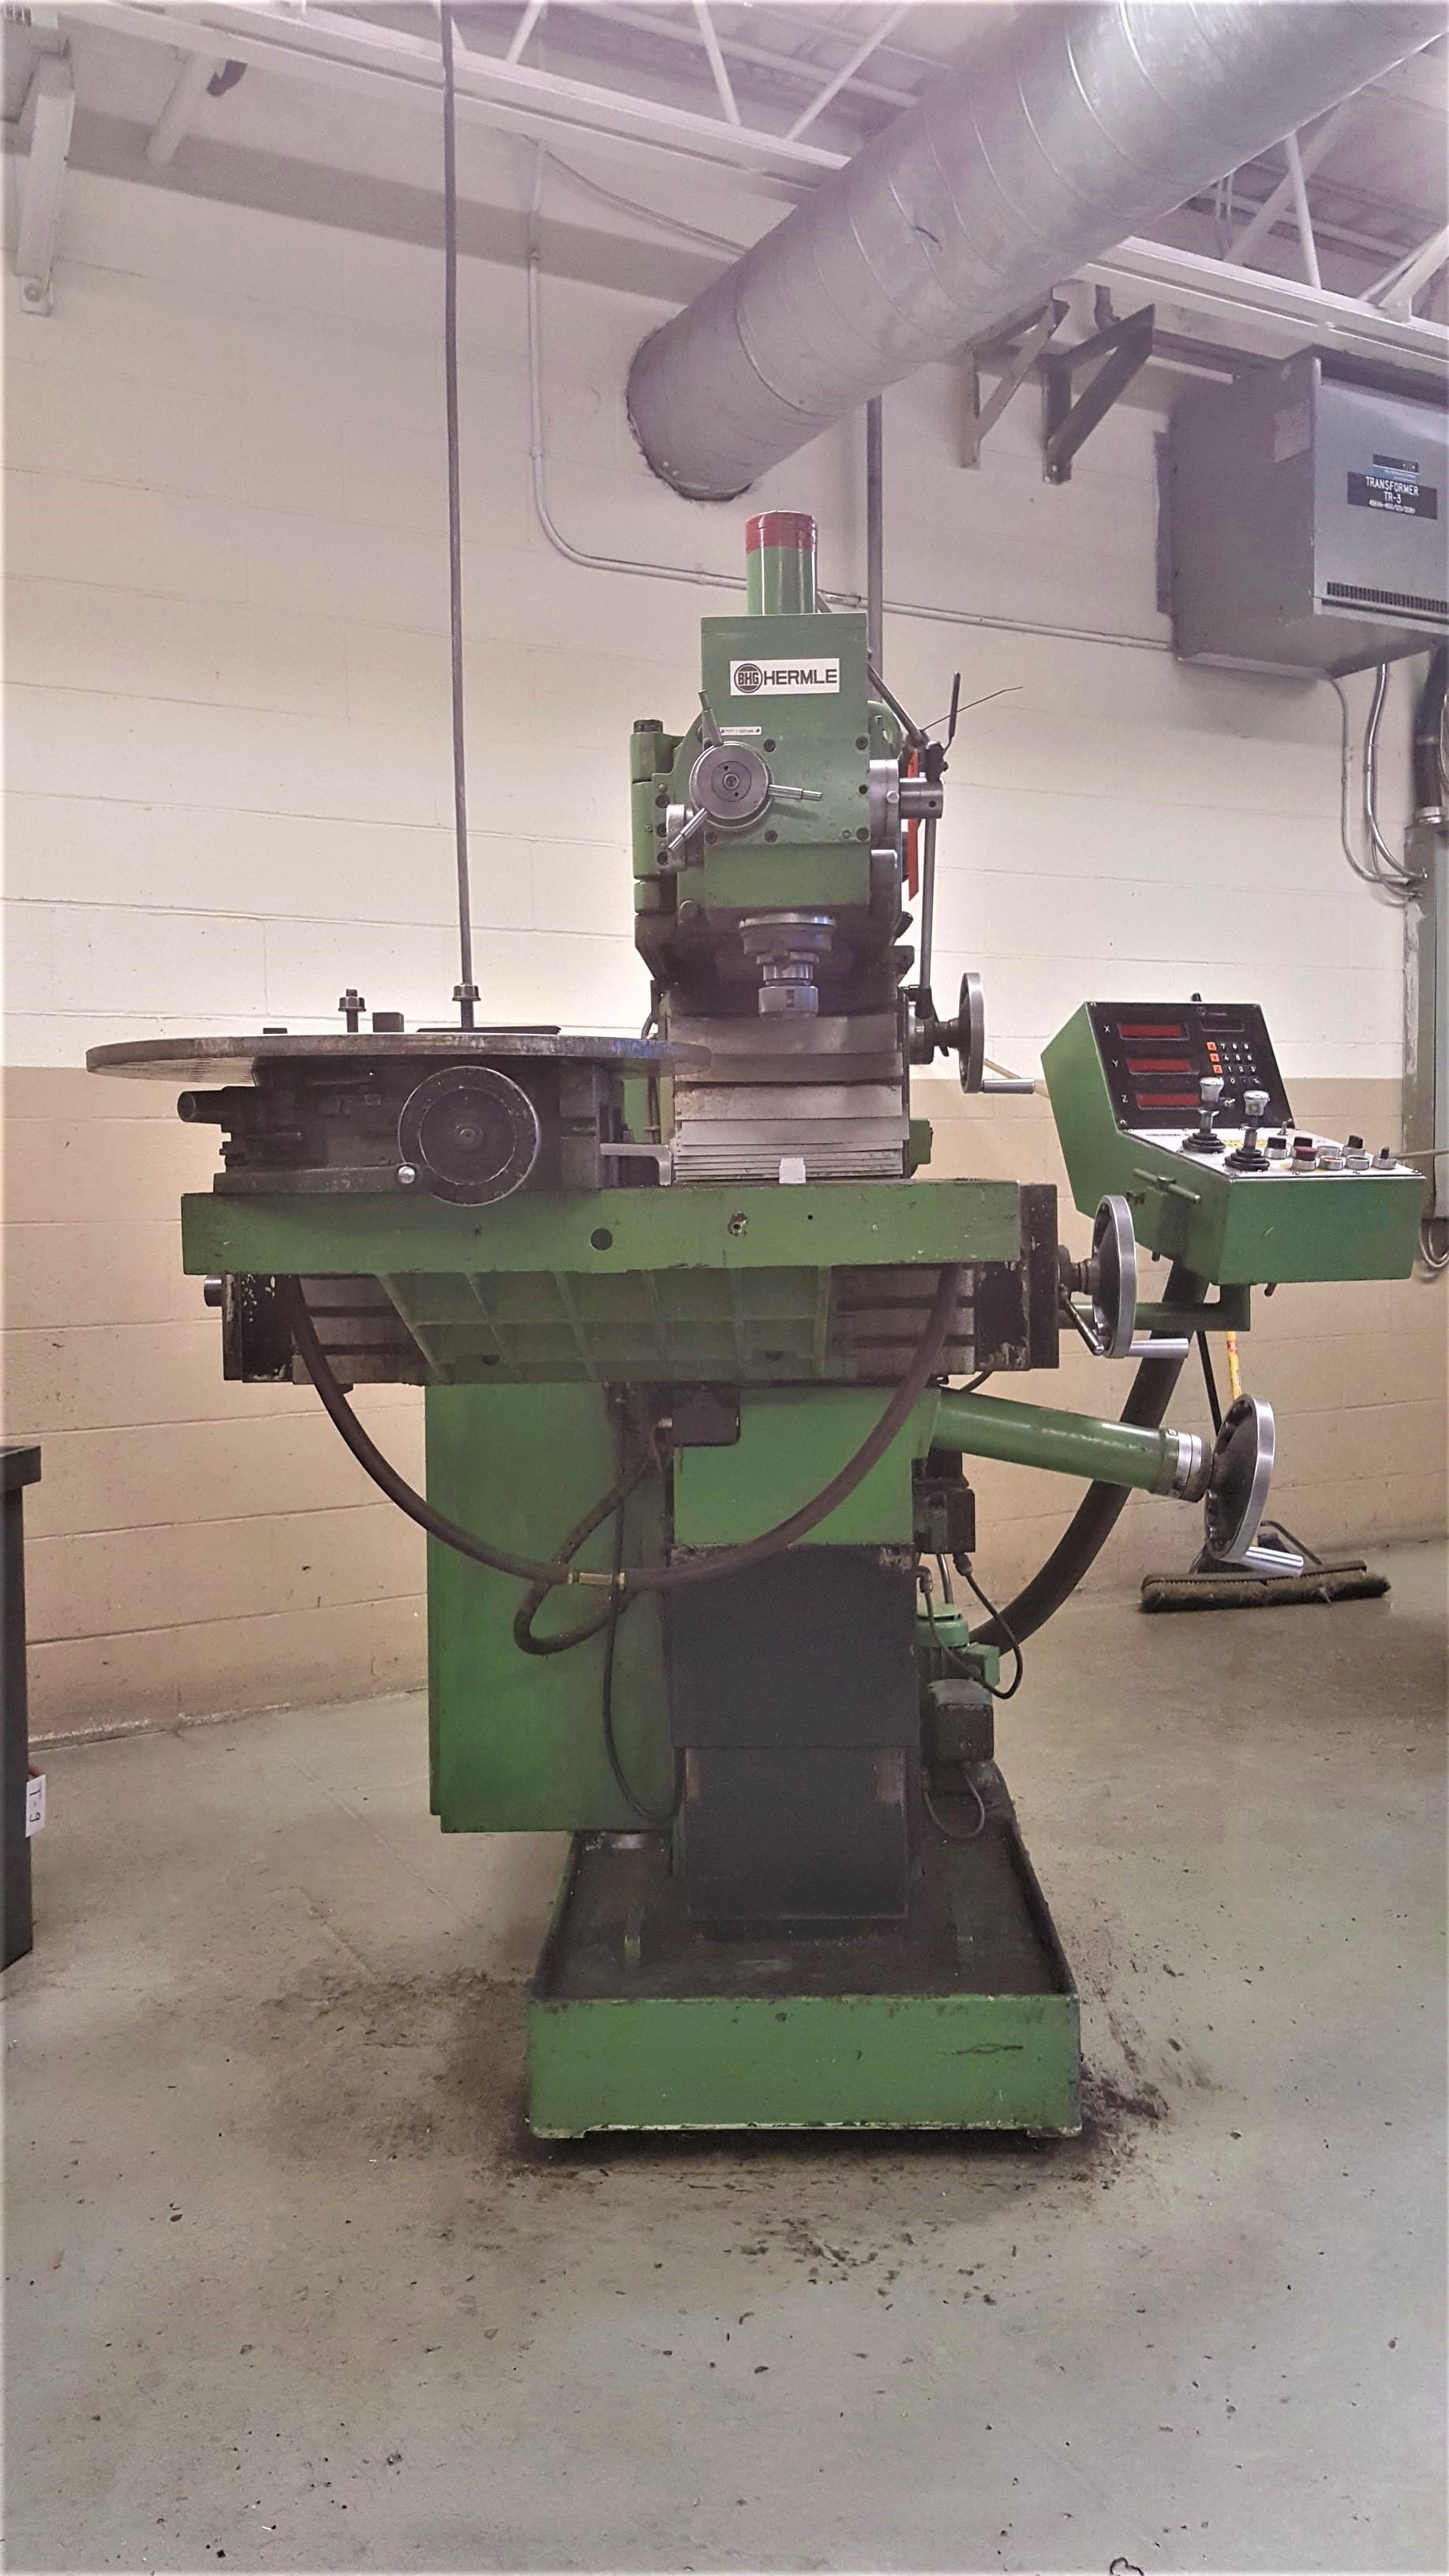 Lot 105 - HERMLE UWF-801 universal milling machine, Heidenhain 3 Axis programmable DRO, 48 - 2,400 RPM spindle